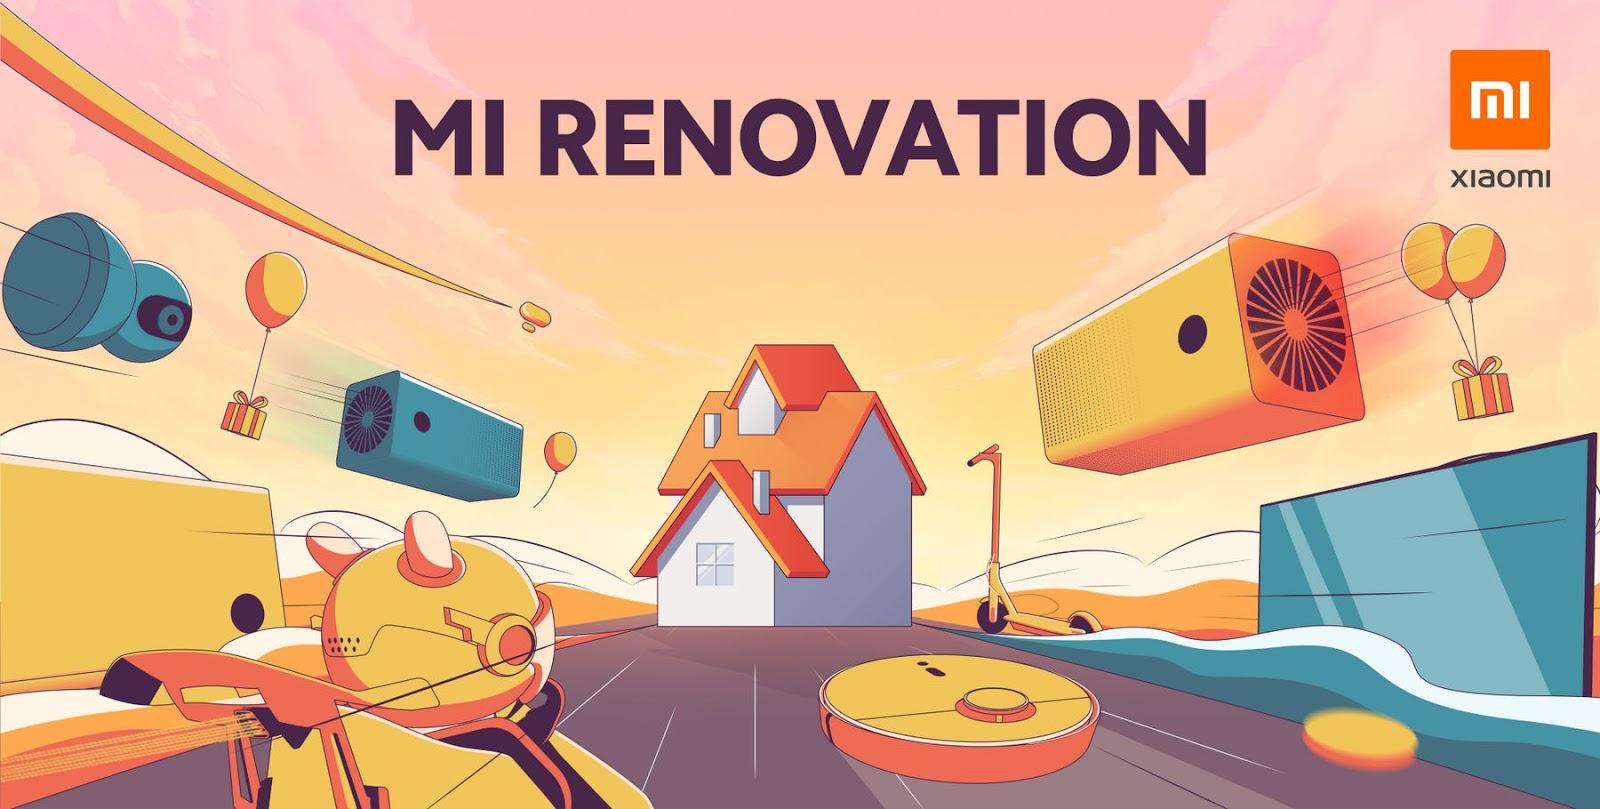 Xiaomi เชิญชวนชาวไทย ลุ้นเป็นผู้โชคดีเข้าร่วมแคมเปญ Mi Renovation: Smart Renovation เนรมิตบ้านของคุณให้มีชีวิตสไตล์ Less is More ที่มาพร้อมเทคโนโลยี Smart Home สุดล้ำ